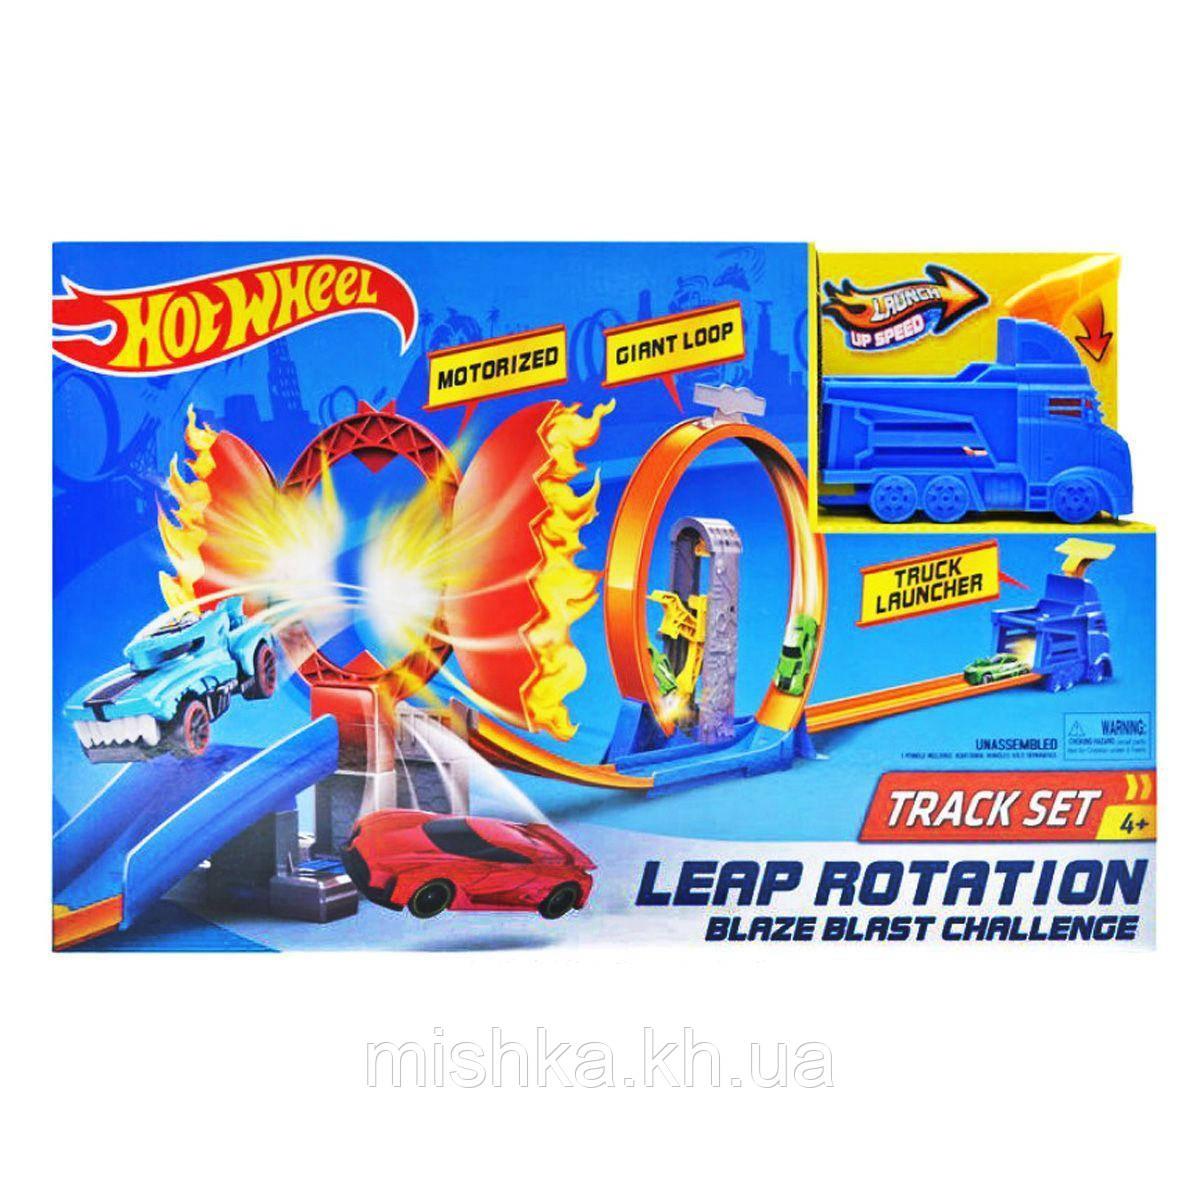 "Трек-запуск ""Hot Wheel"" ""Truck"" (+1 машинка) 5789 (Мас)"